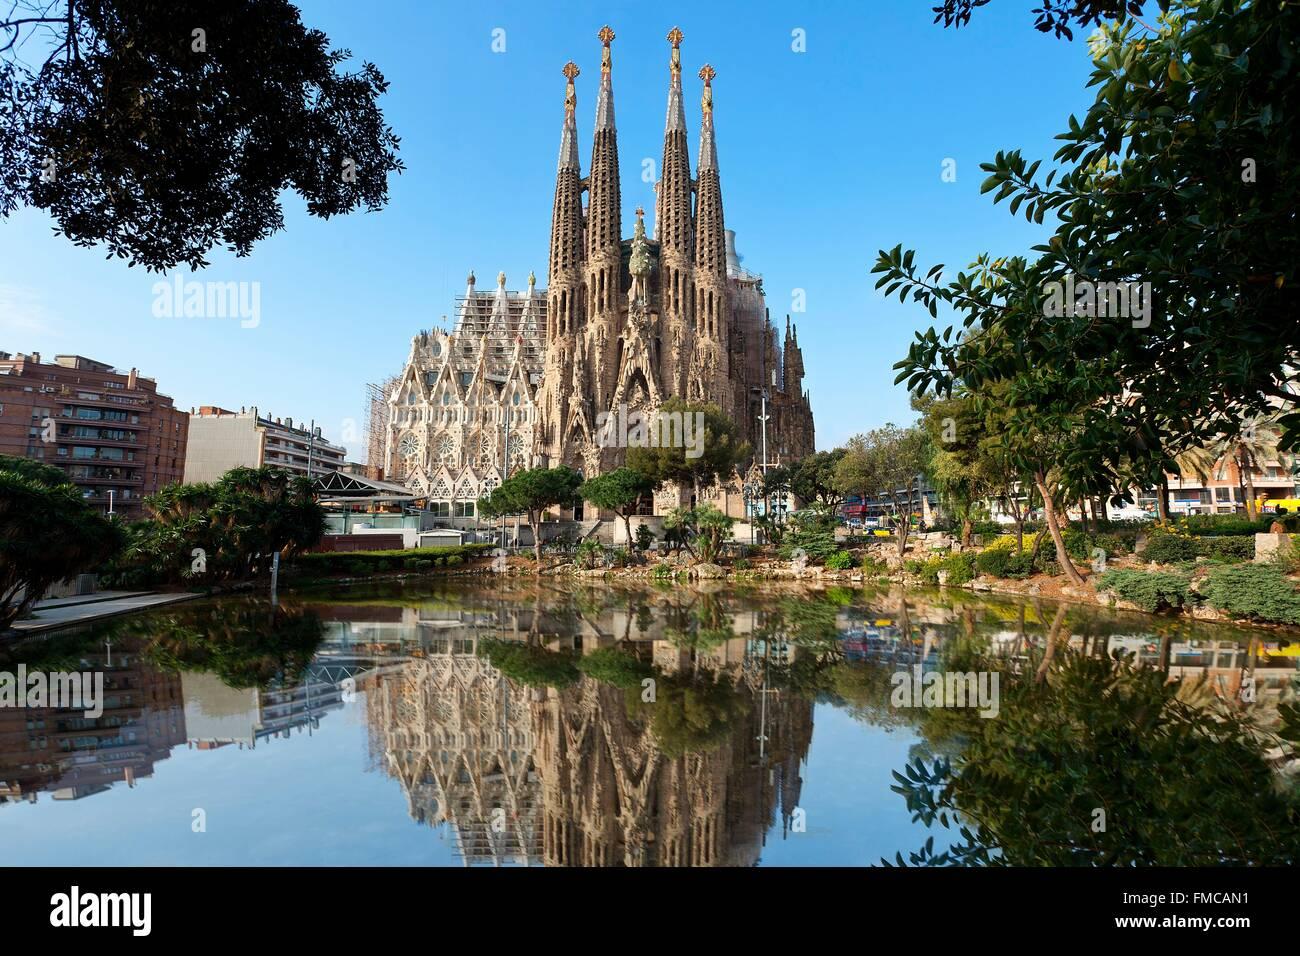 Espagne, Catalogne, Barcelone, Sagrada Familia, la cathédrale inscrite au Patrimoine Mondial de l'UNESCO Photo Stock